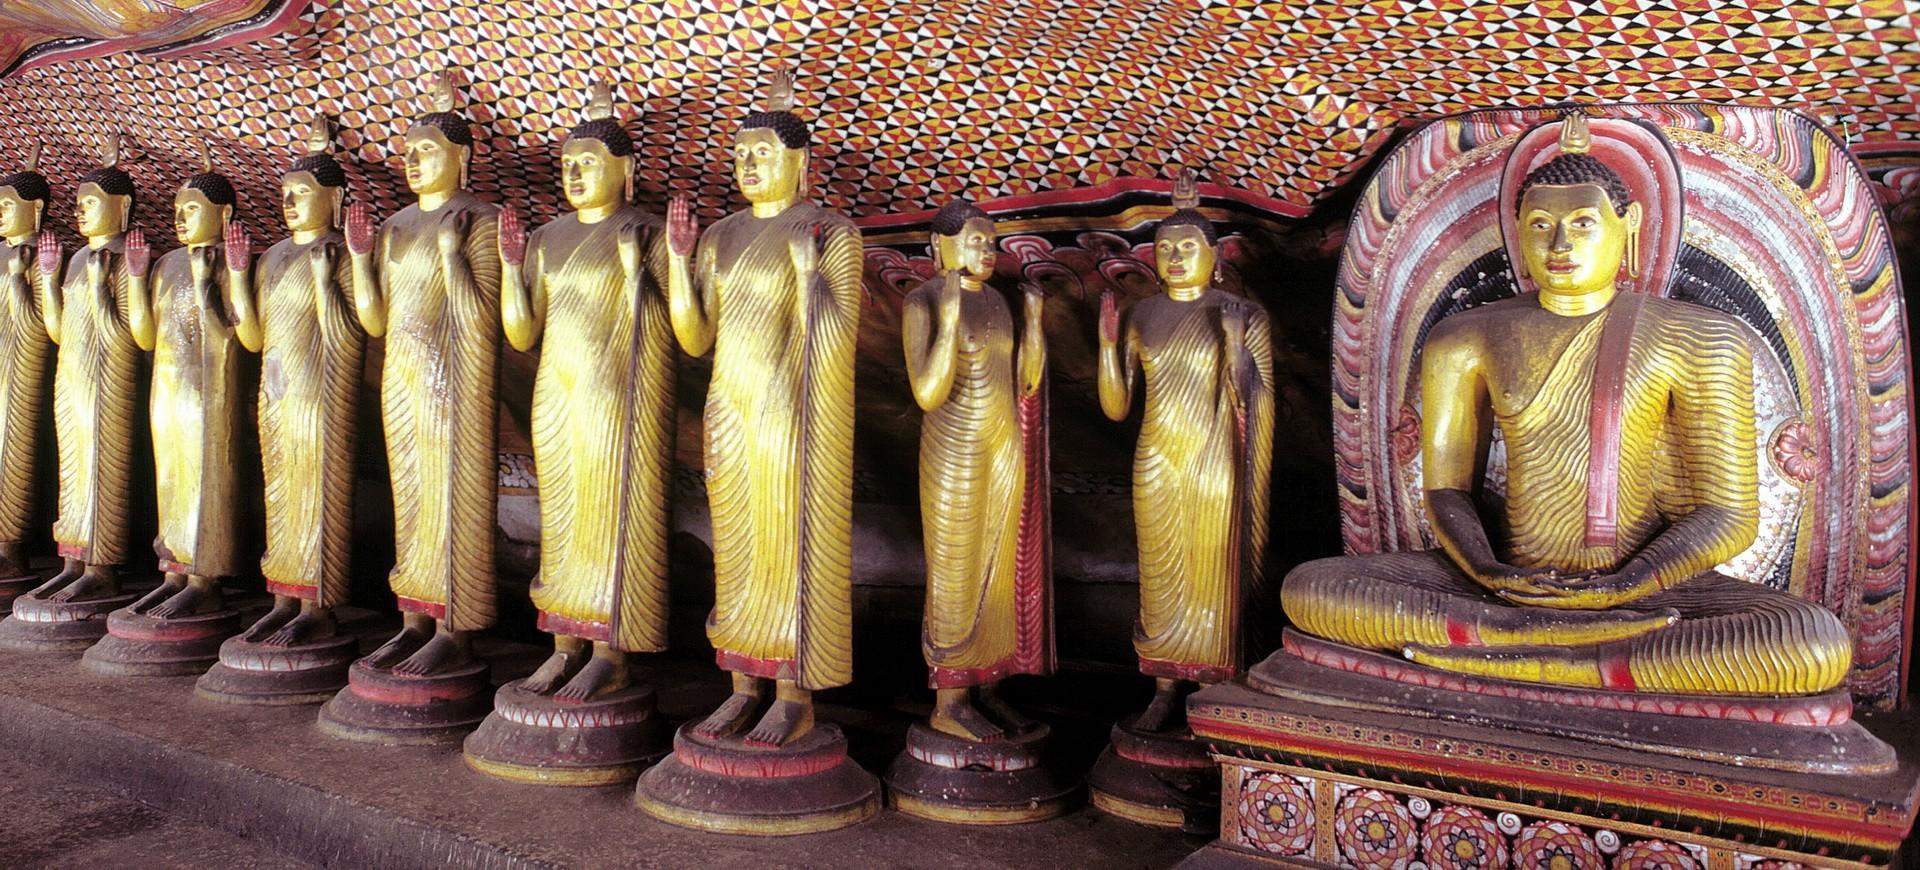 Sri Lanka Dambulla Statues de Bouddha dans le Monastère dans la Grotte